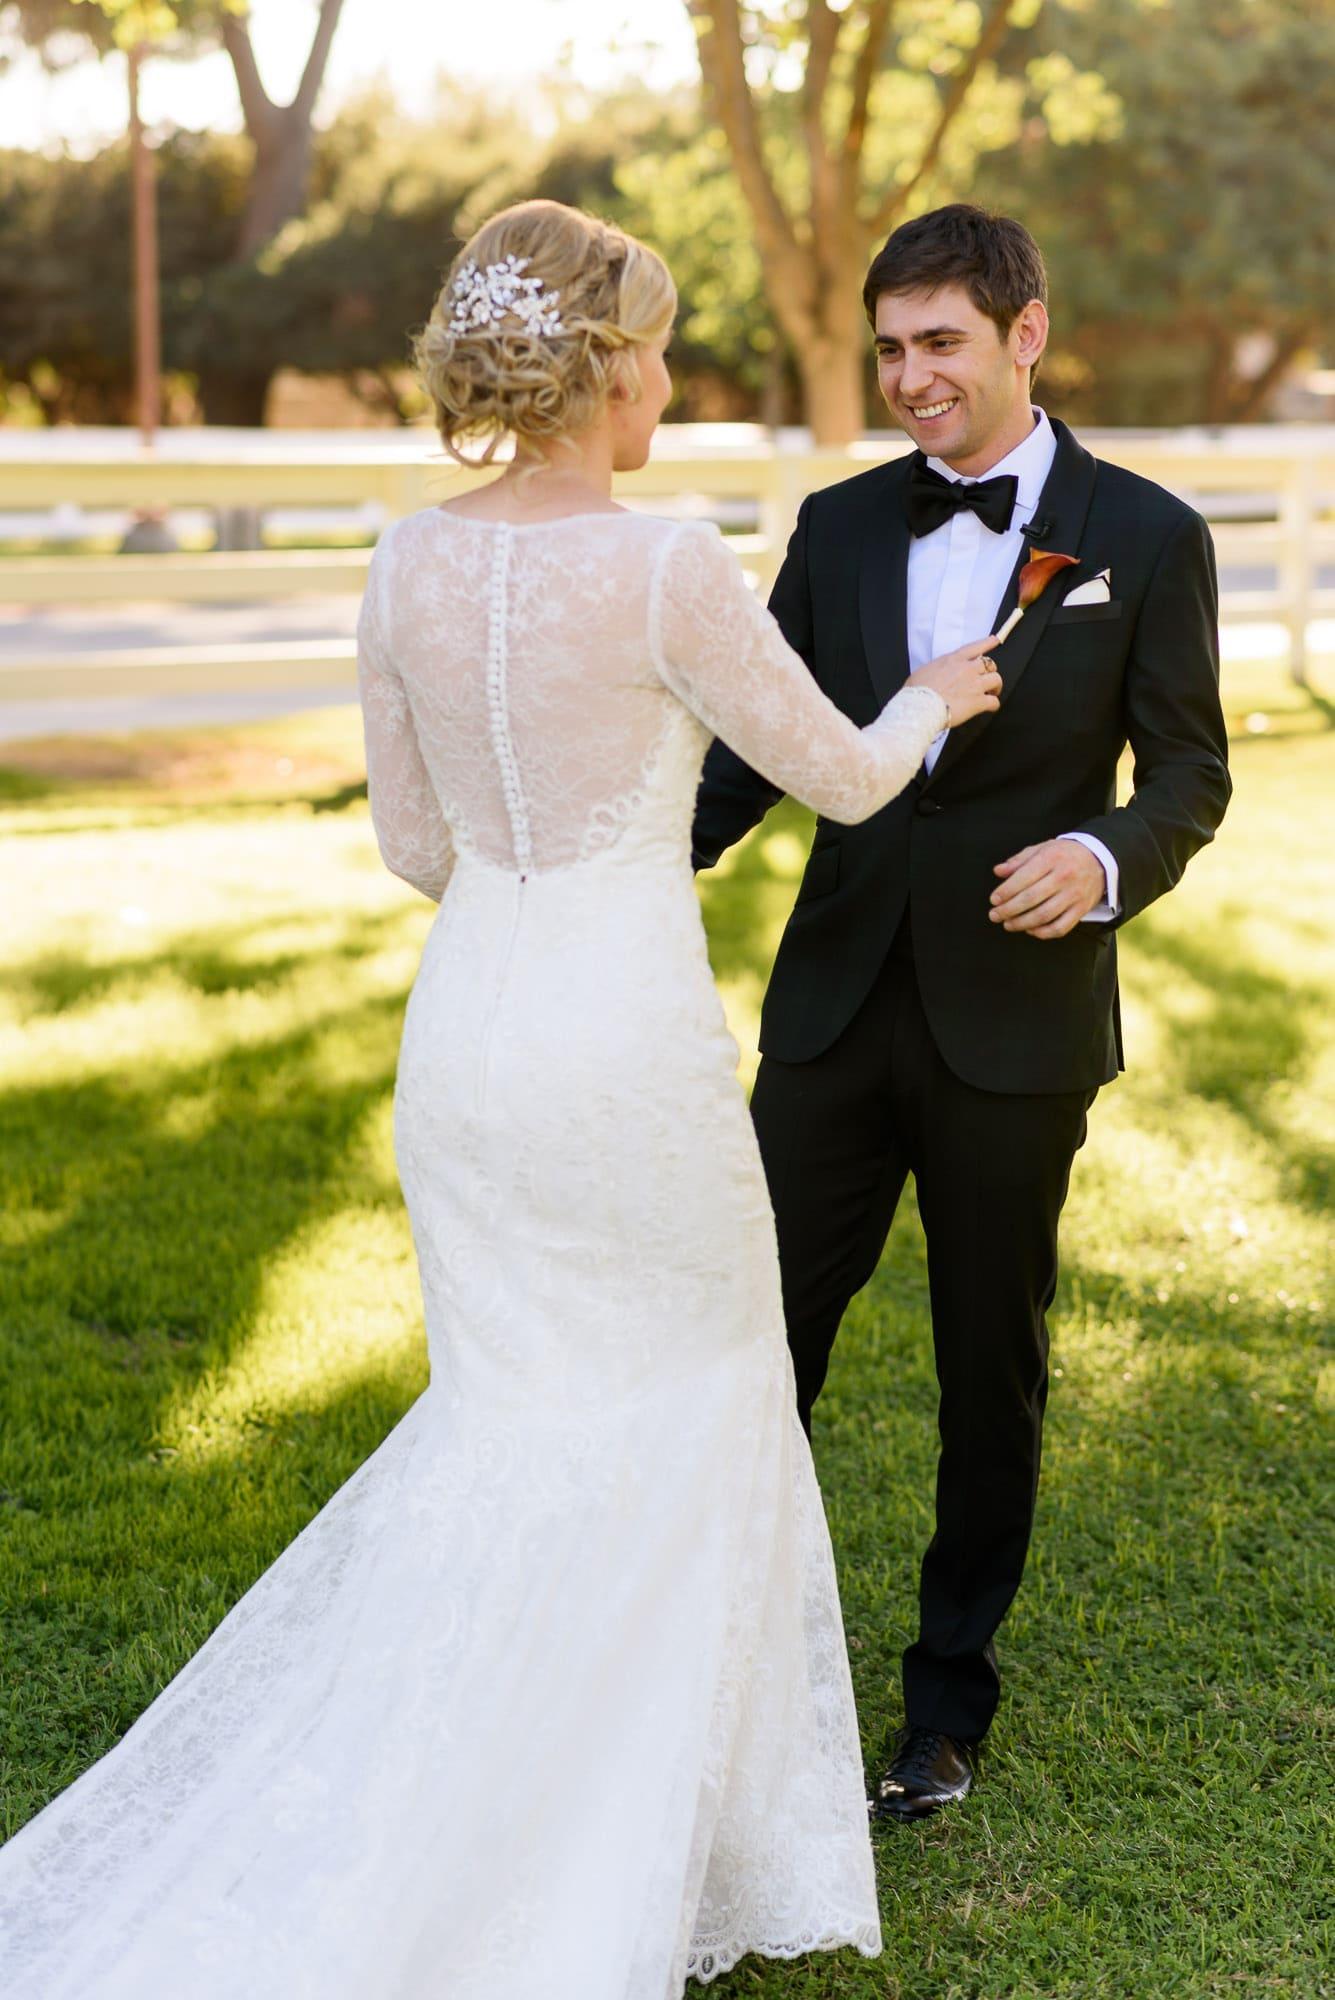 021_Alan_and_Heidi_Los_Angeles_Equestrian_Center_Wedding